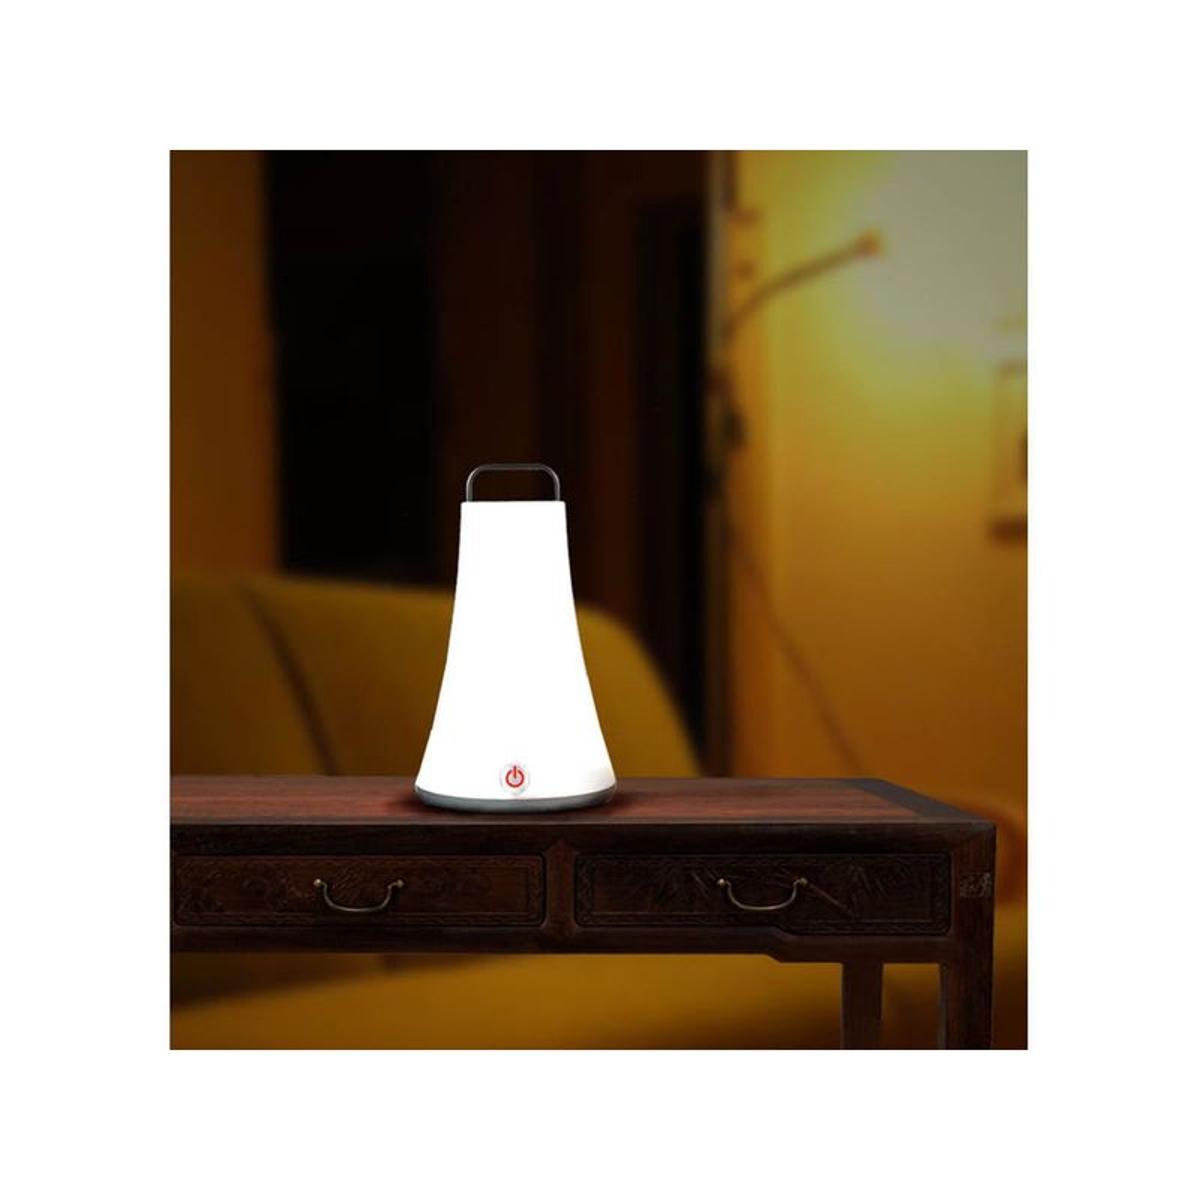 Lanterne lumineuse blanche autonome